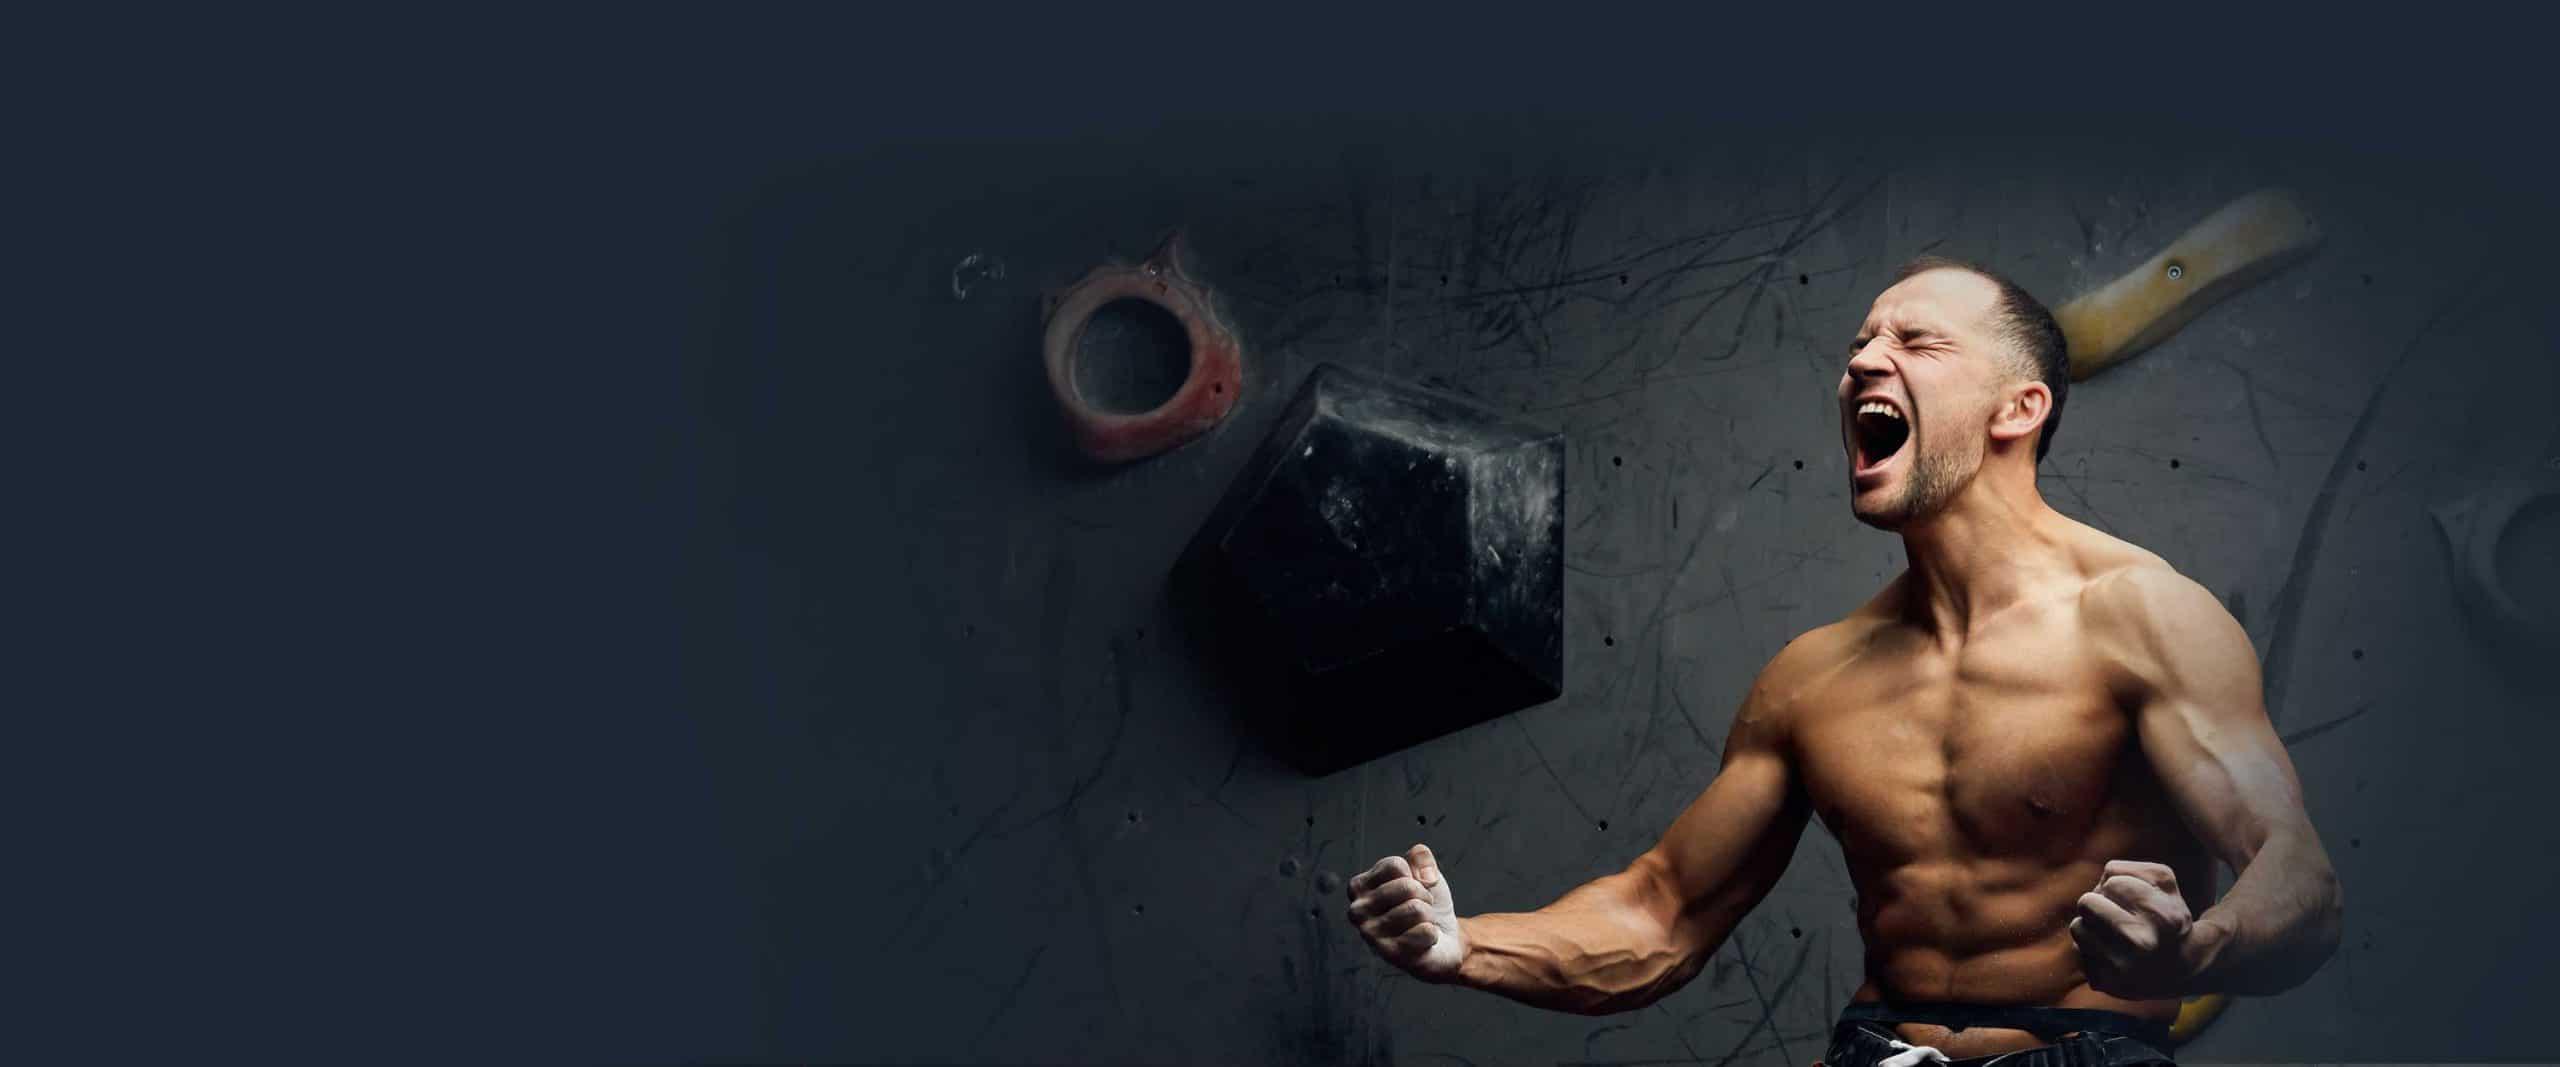 5 Monate gratis Trainieren Angebot Fitnessstudio Limburg